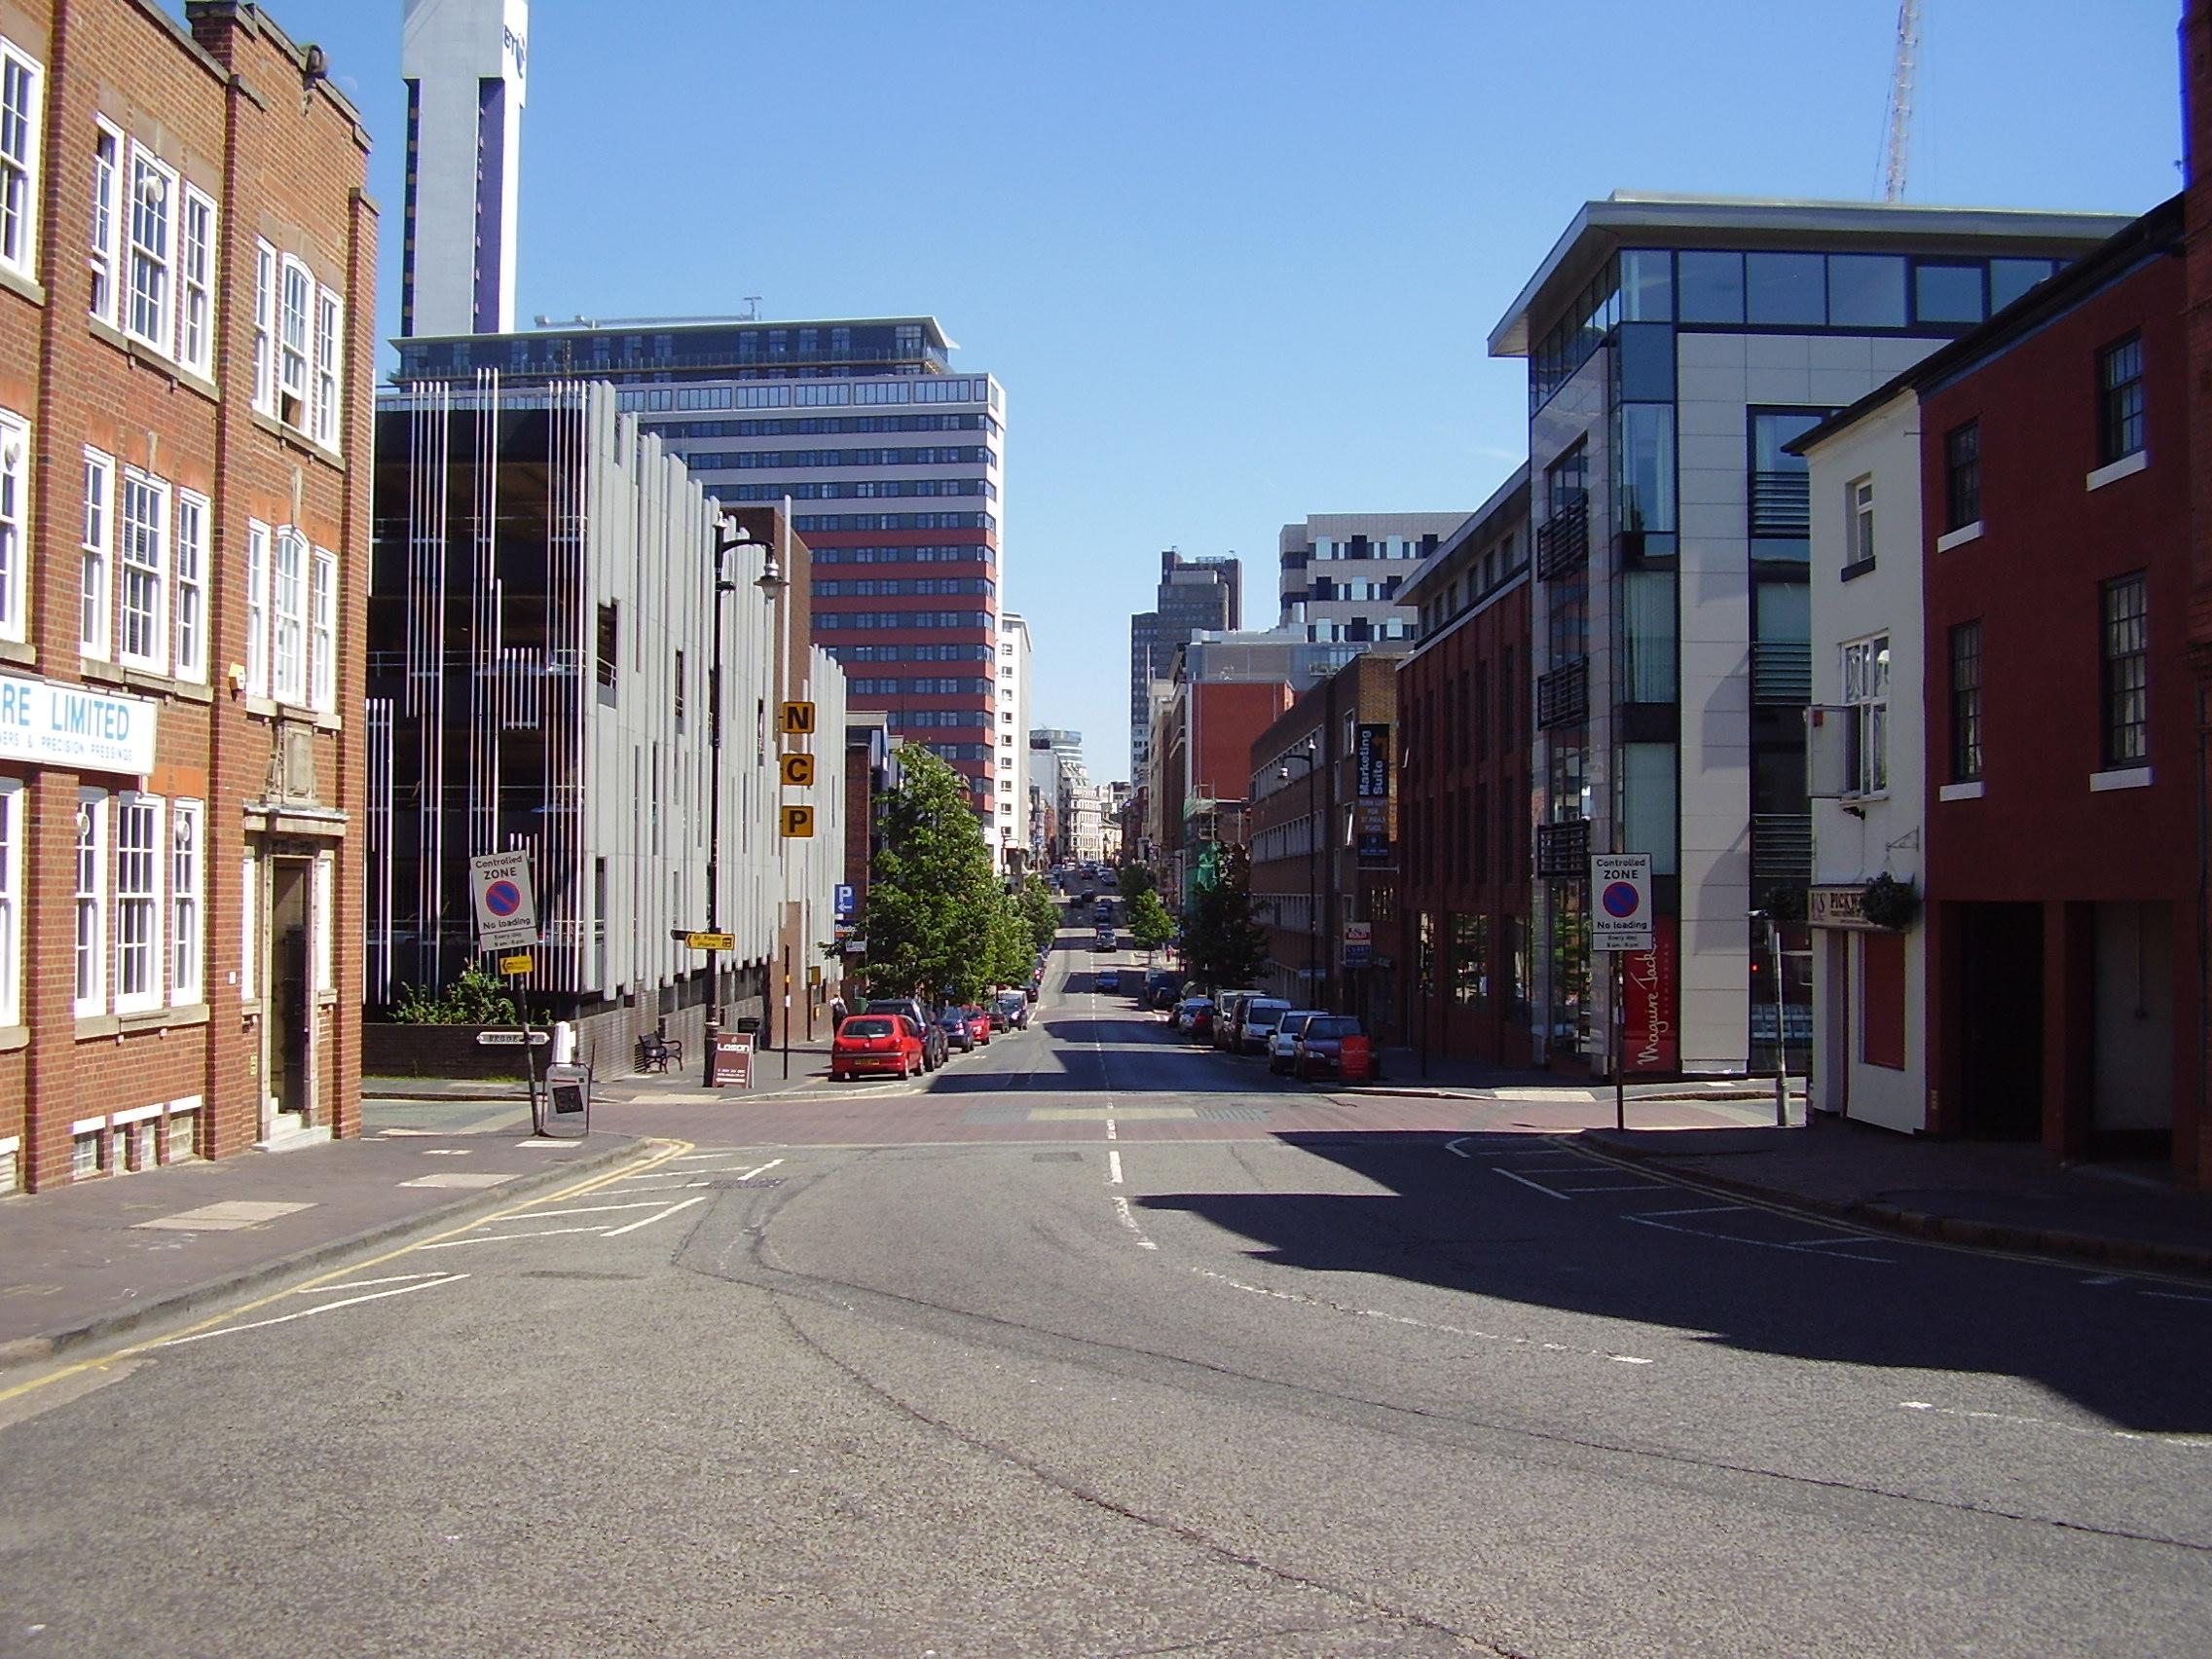 2008 Street view photo 16 of St Pauls Square Area of the Jewellery Quarter Birmingham